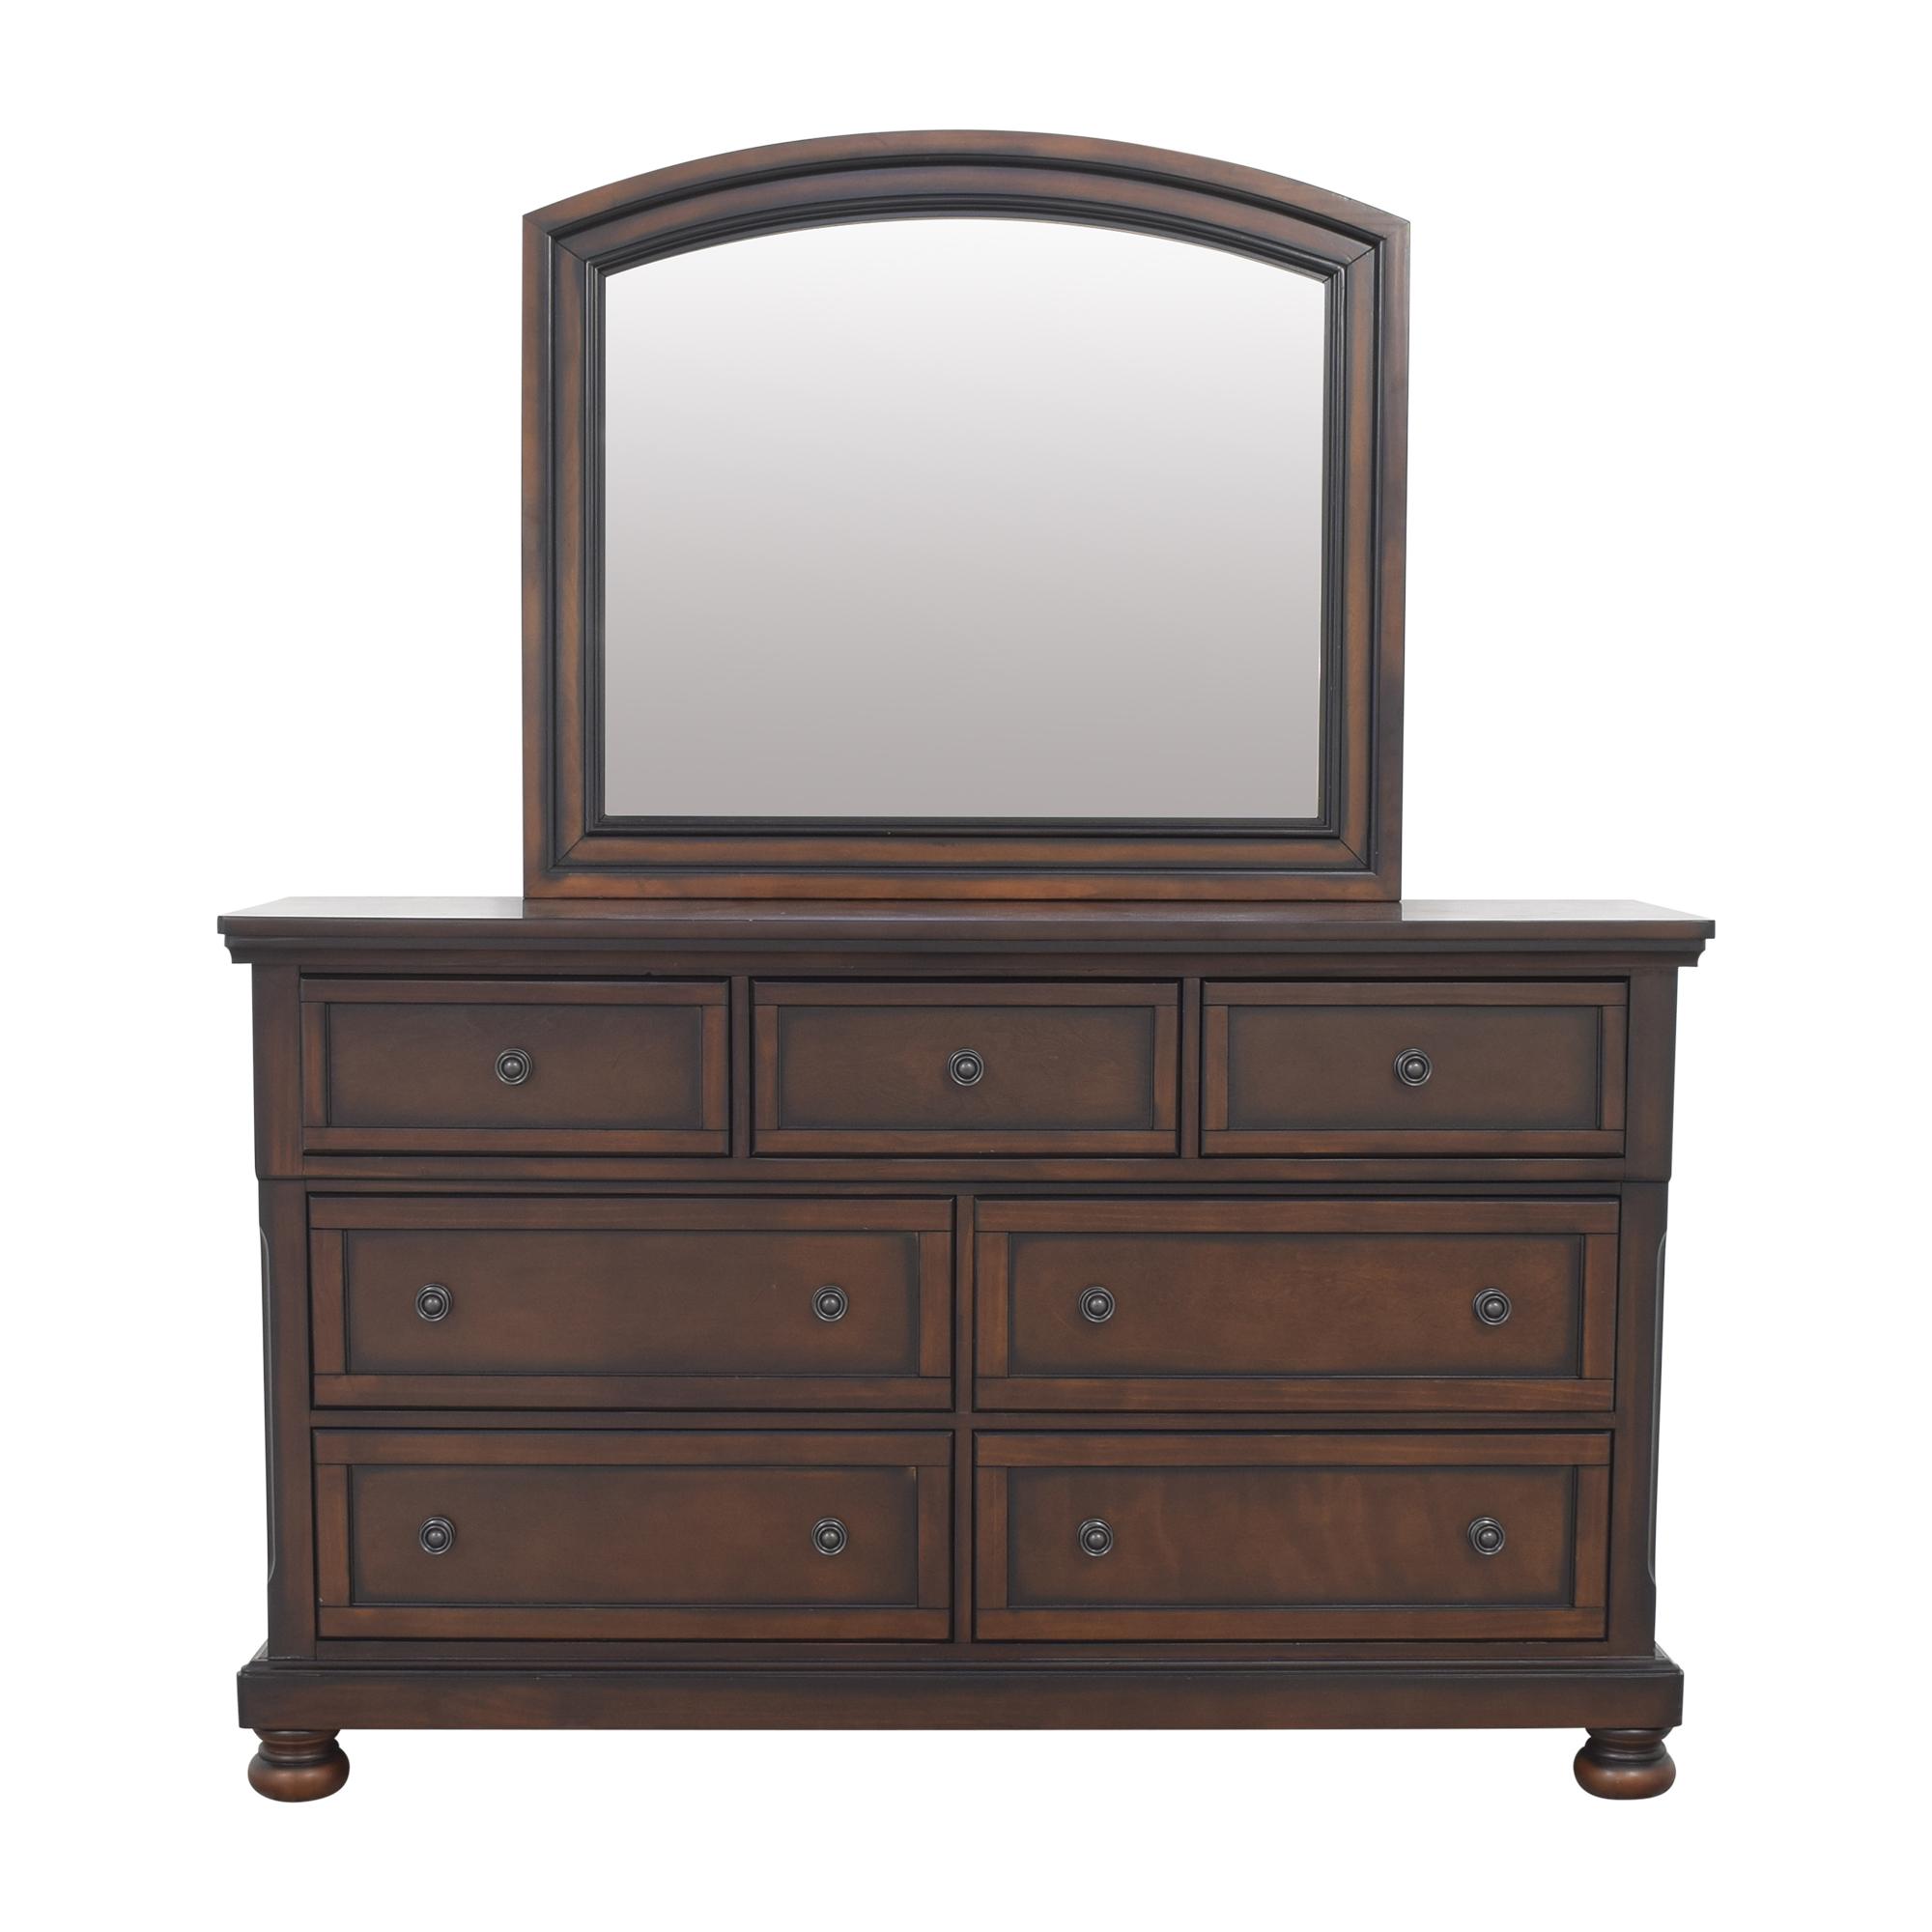 Raymour & Flanigan Donegan Dresser and Mirror / Storage